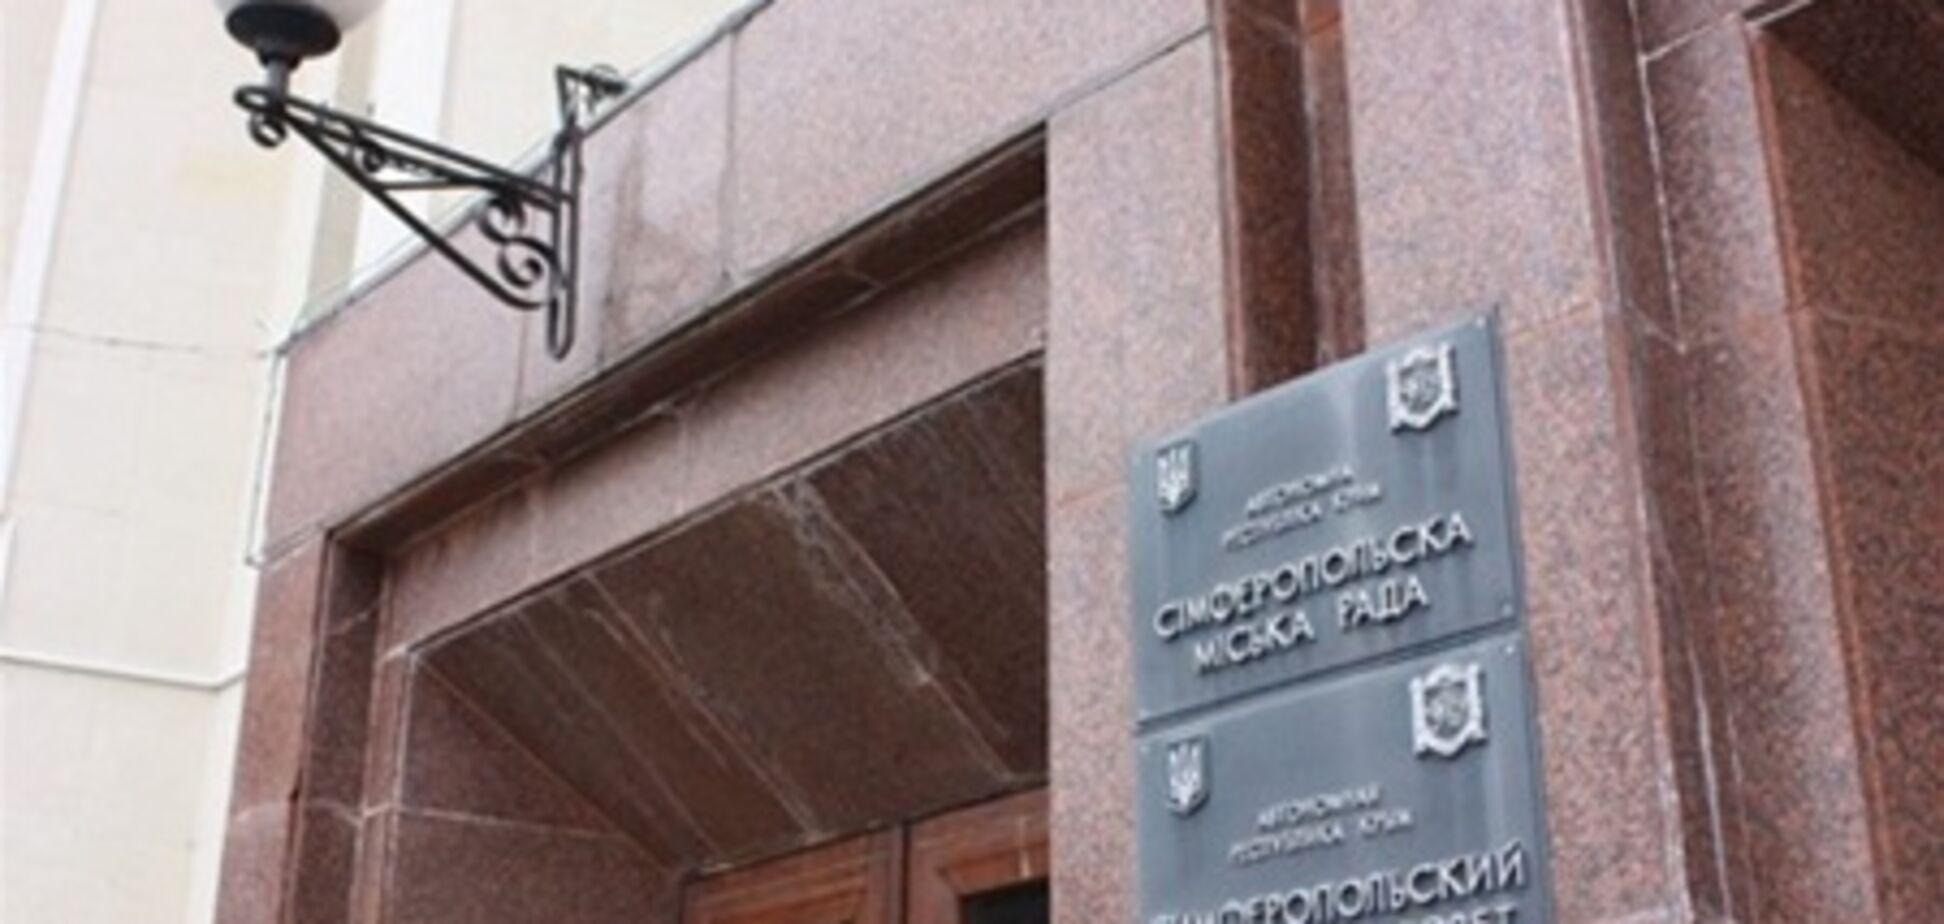 Заммэра Симферополя поймали на коррупции, но дело замяли